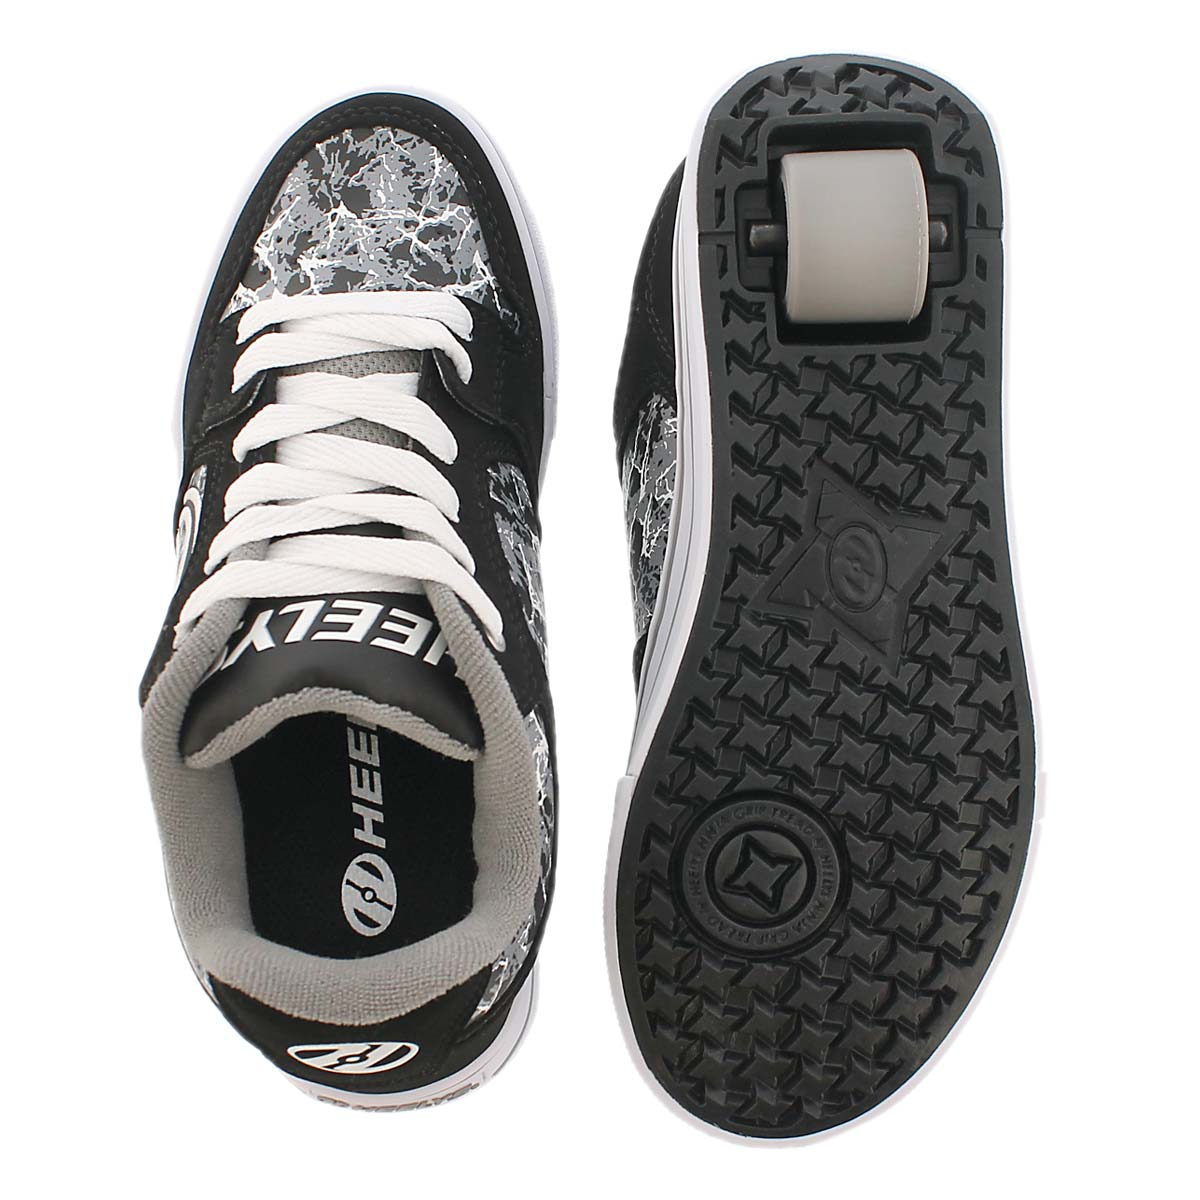 Bys Motion blk/grey skate sneaker